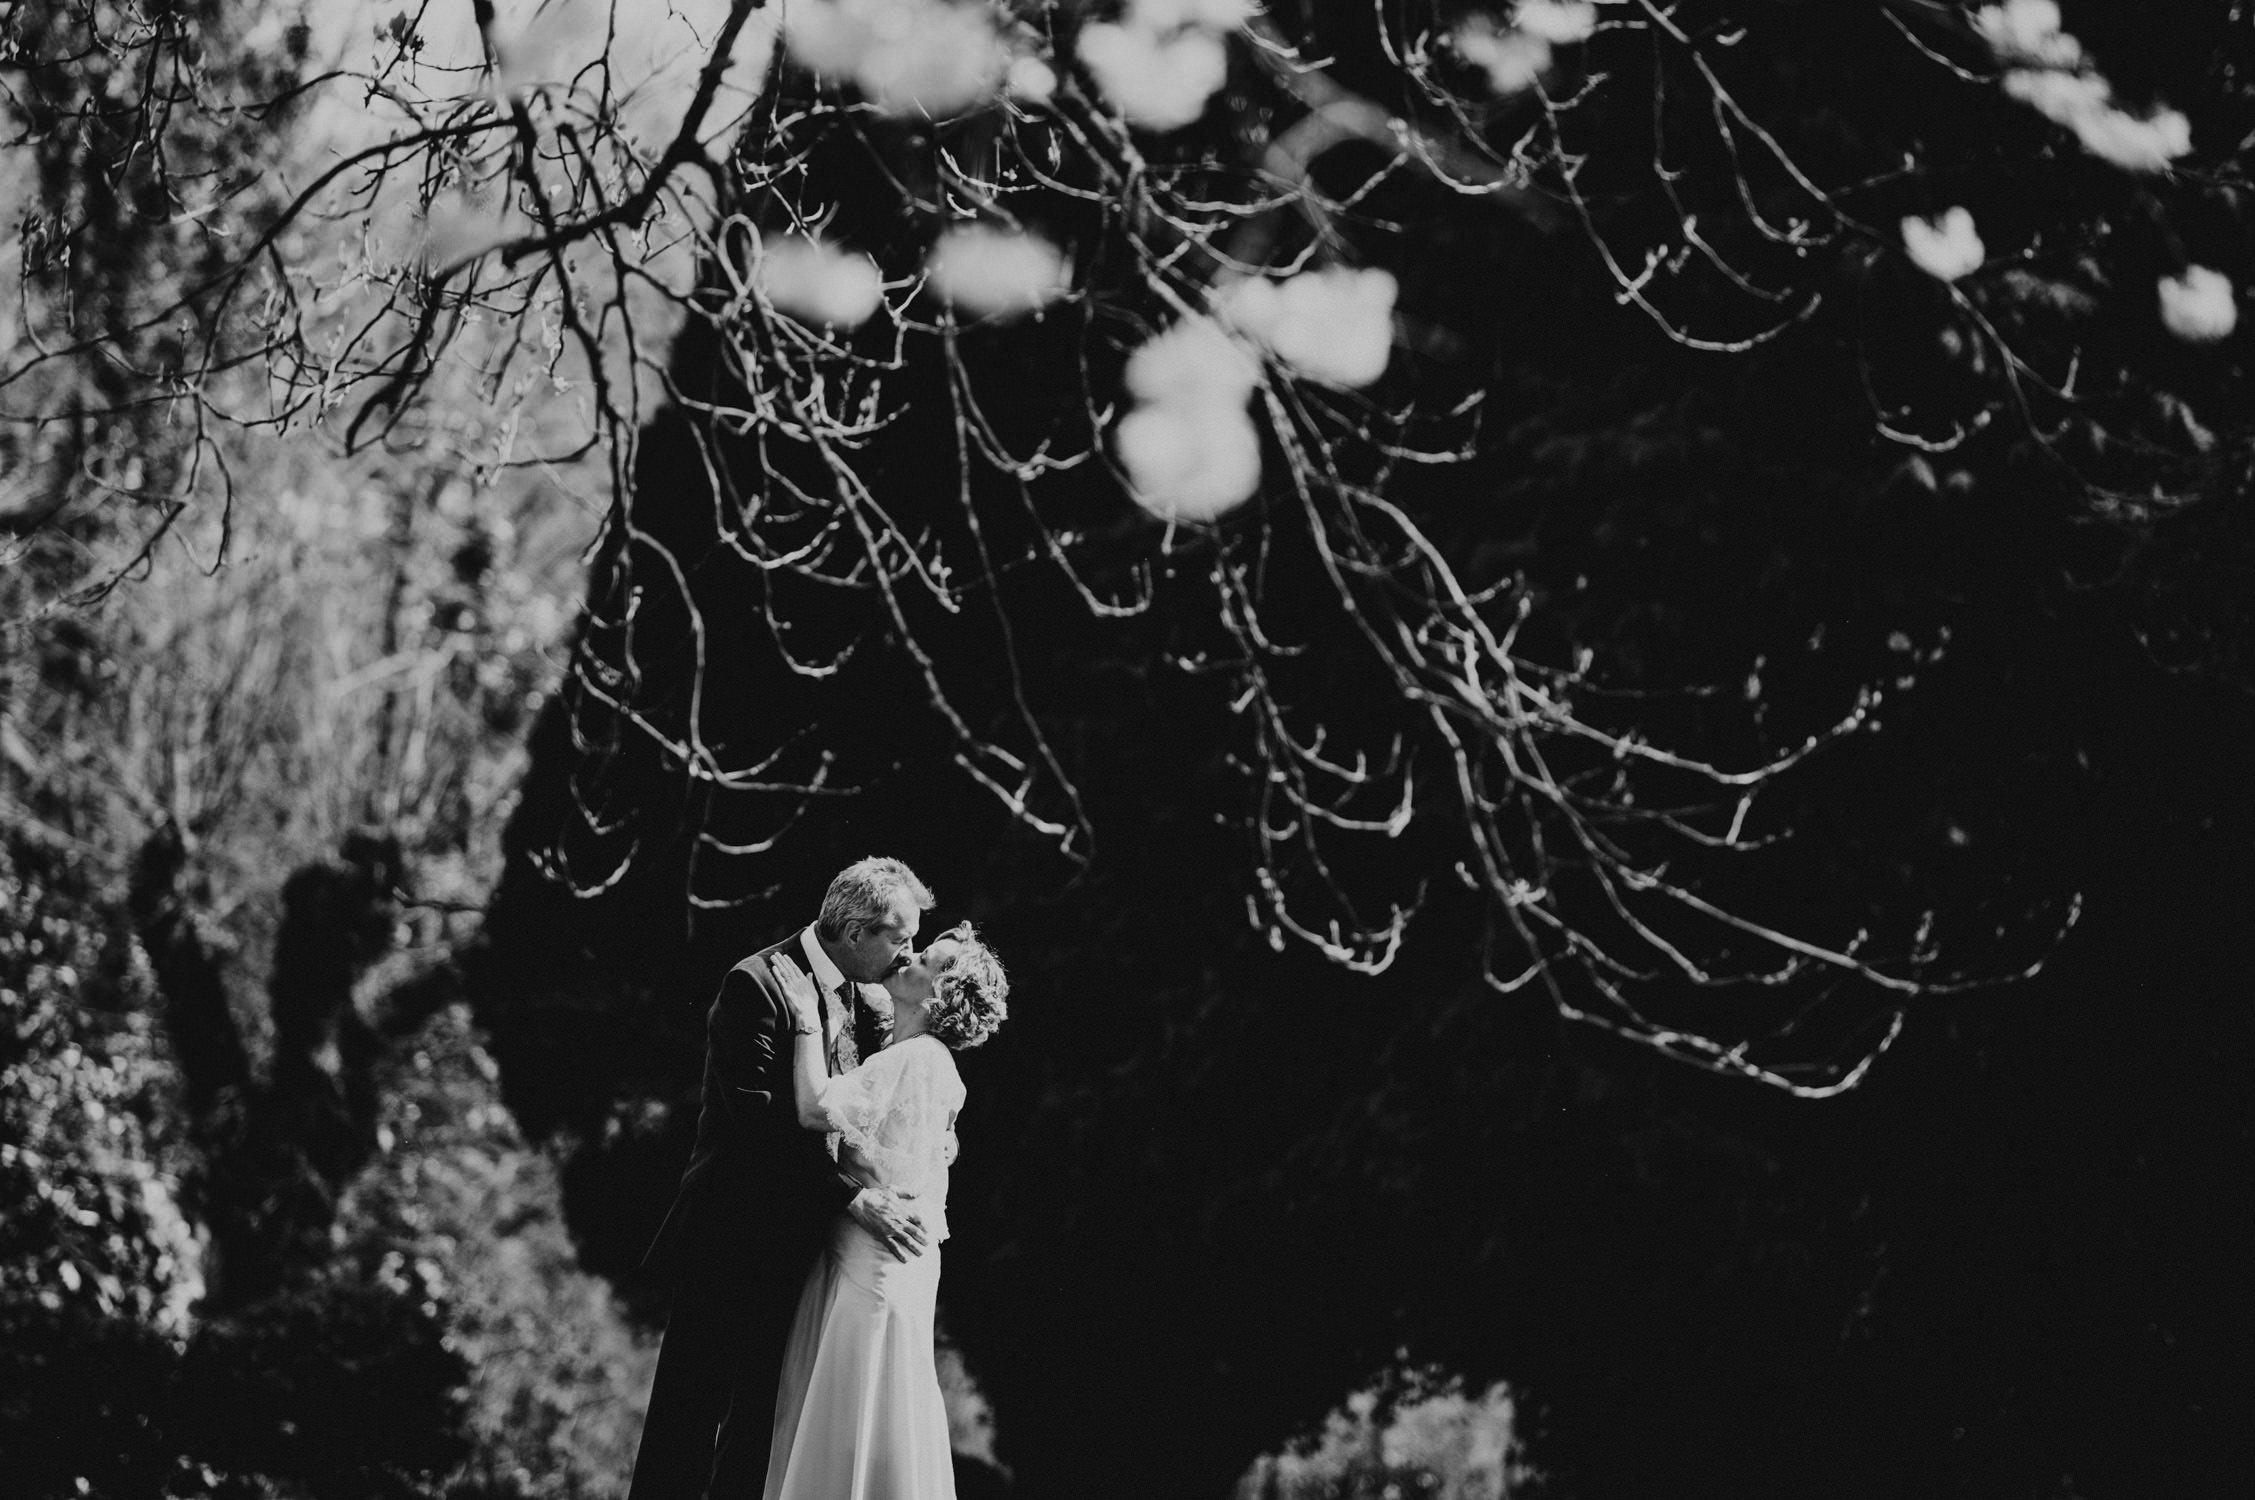 hartnoll-hotel-wedding-photographer-devon